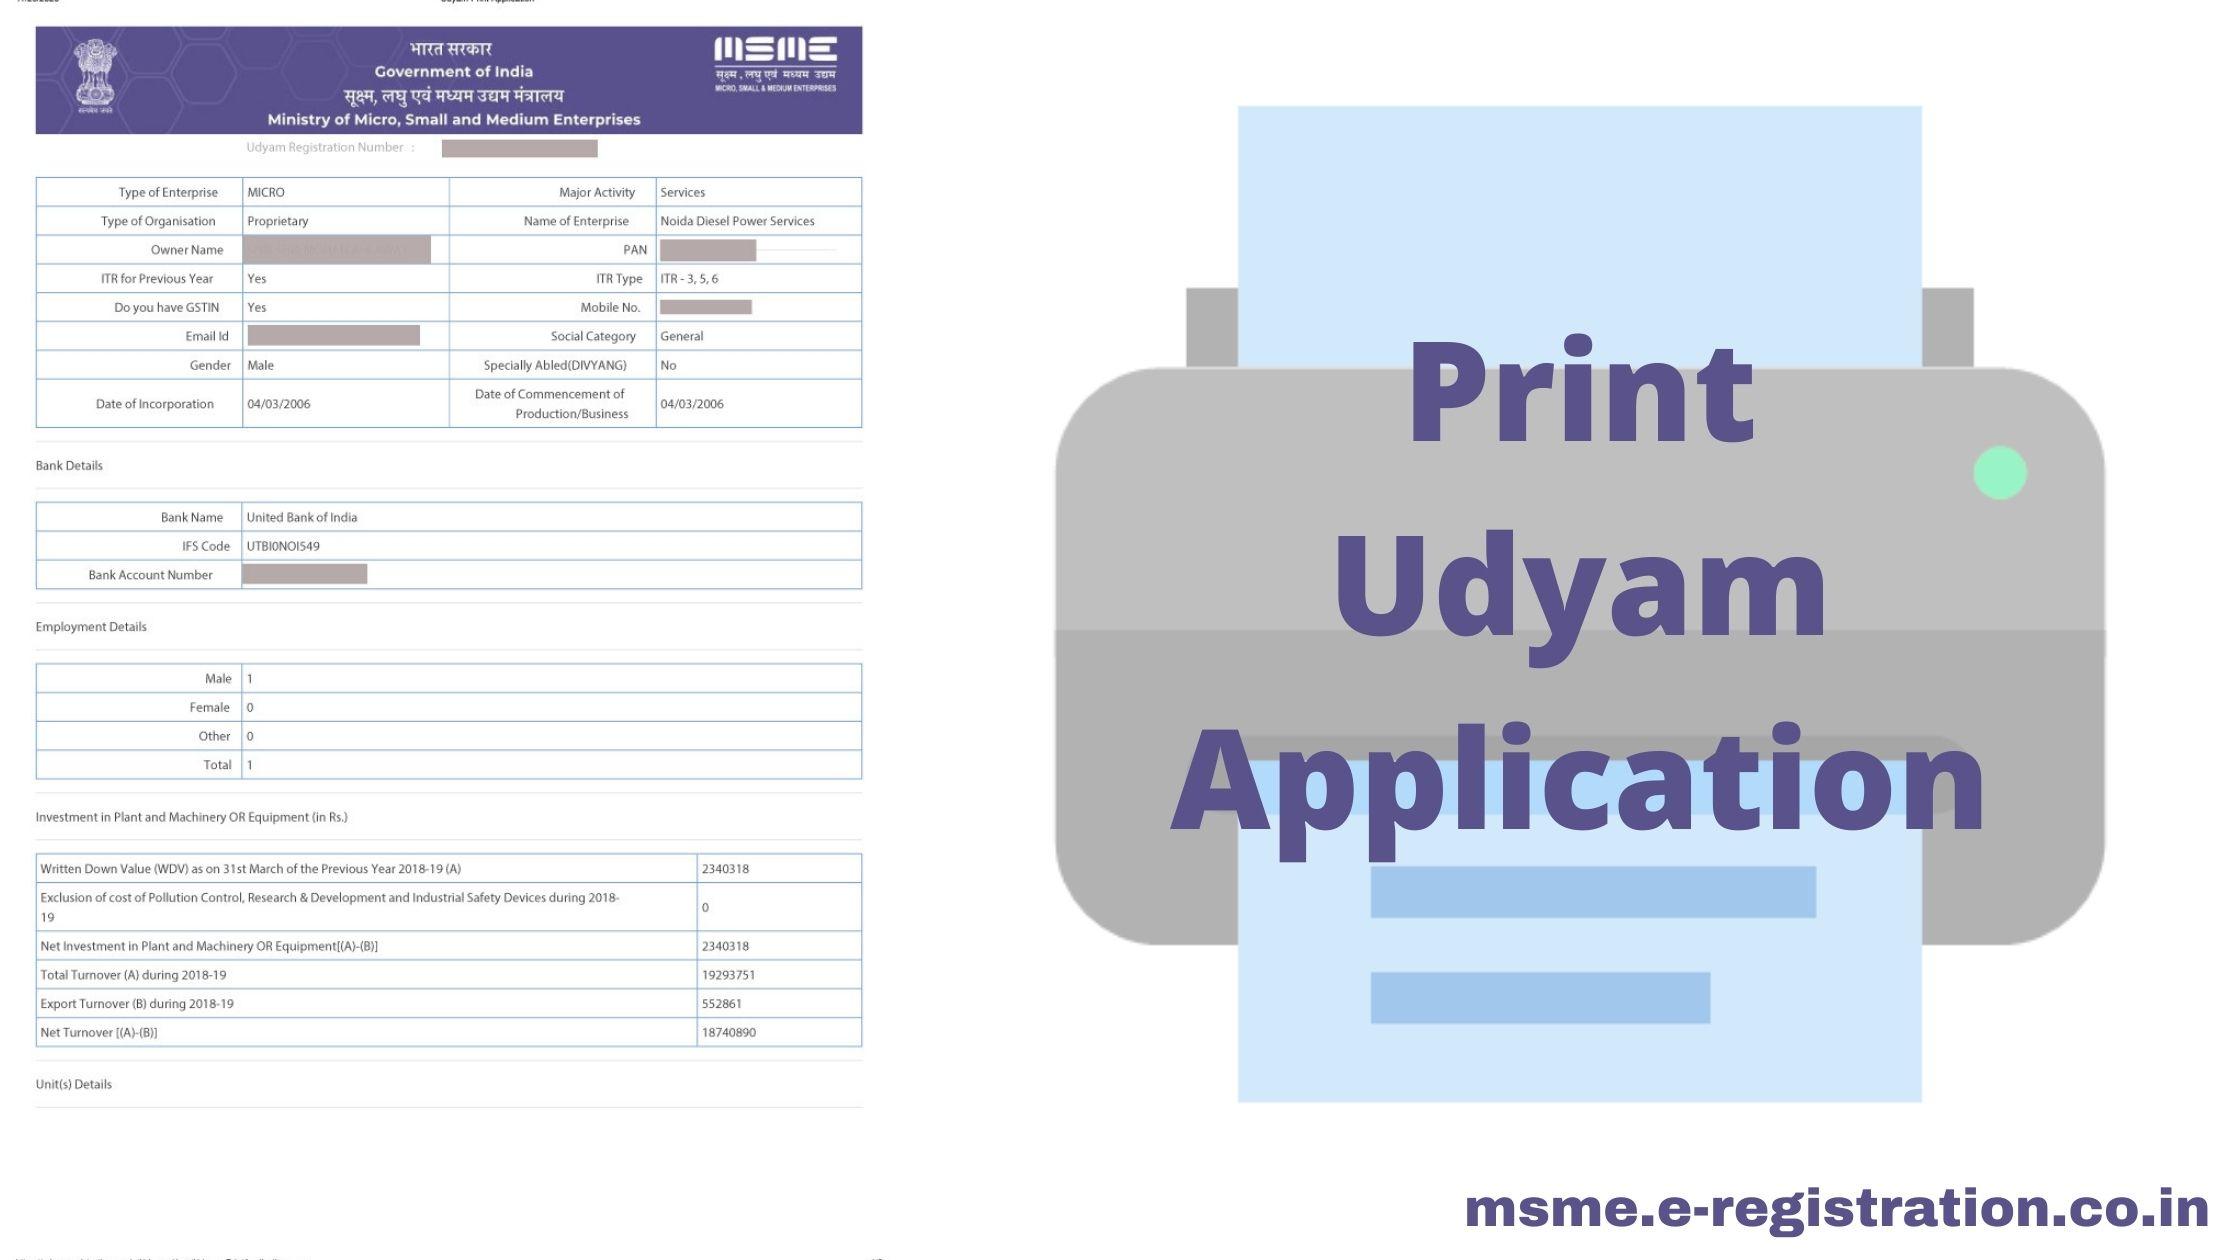 Print Udyam Application